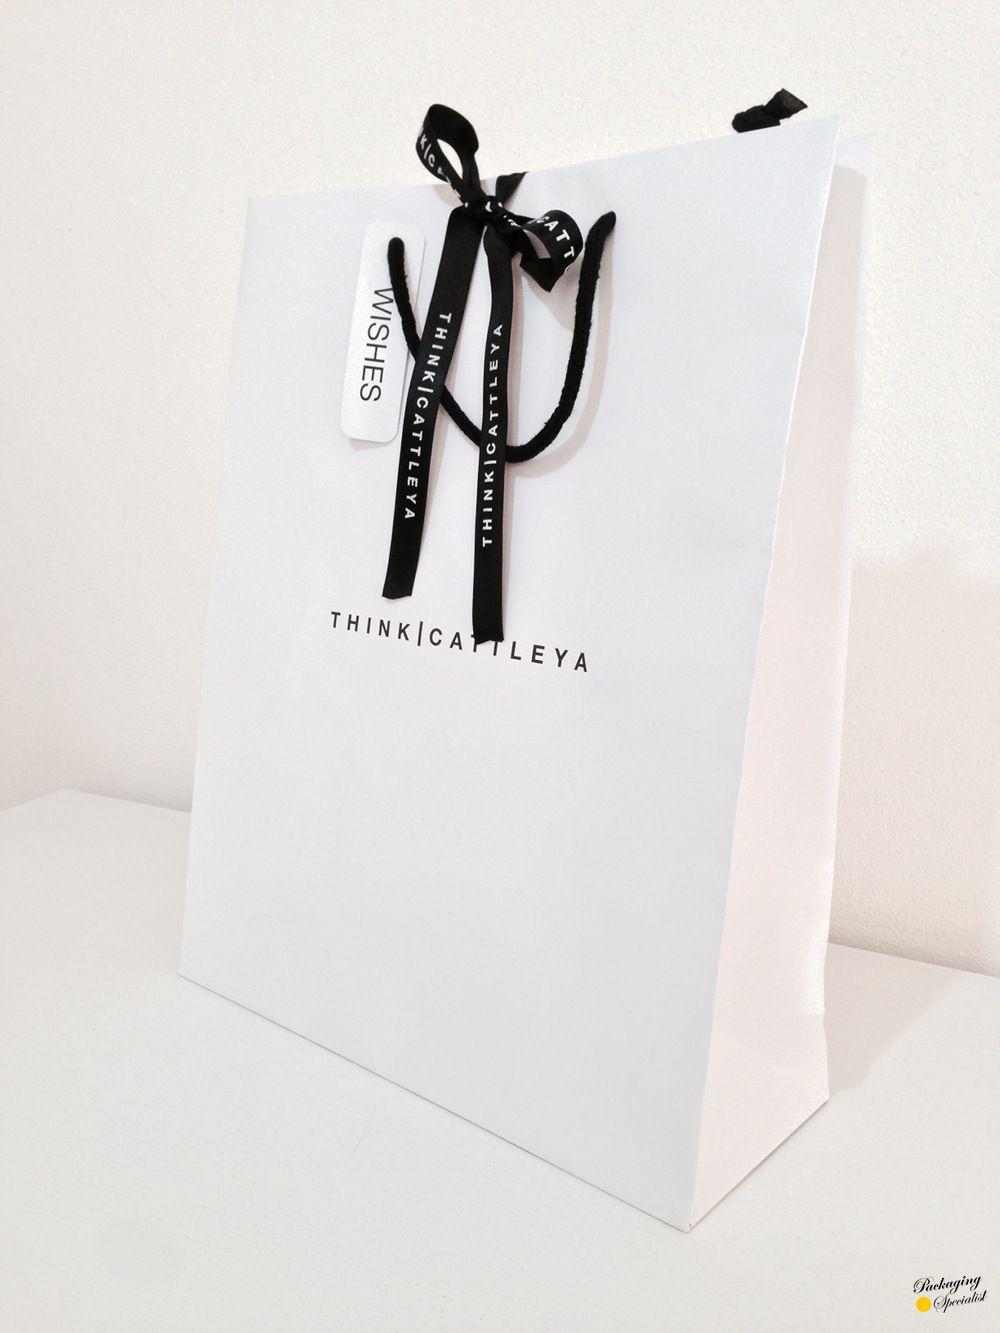 Design packaging packaging specialist packaging - Luxury Paper Bag W Custom Ribbon By Pkgsp Packaging Specialist